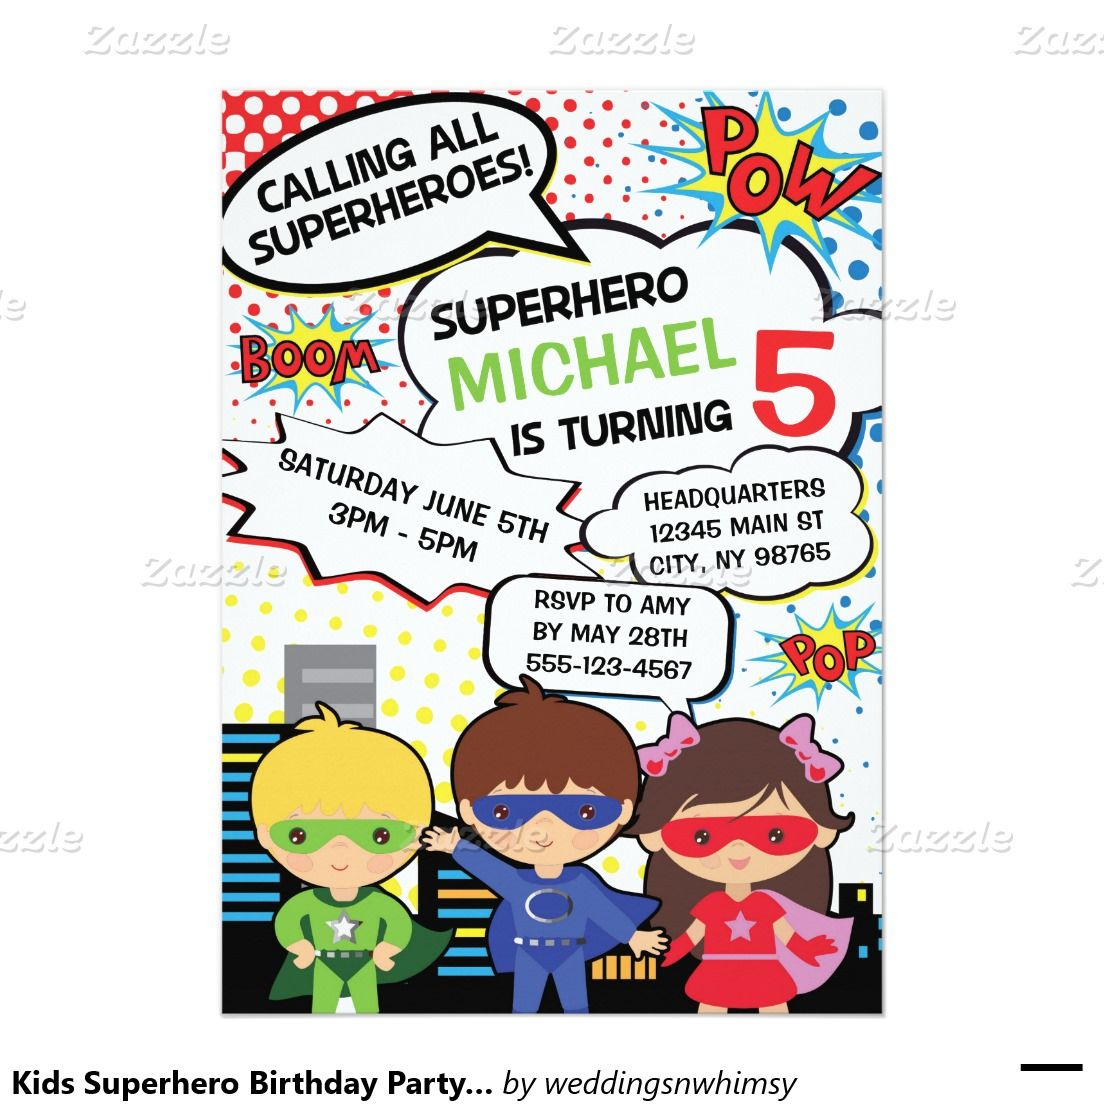 Kids Superhero Birthday Party Invite Boy Girl Hero | Superhero ...